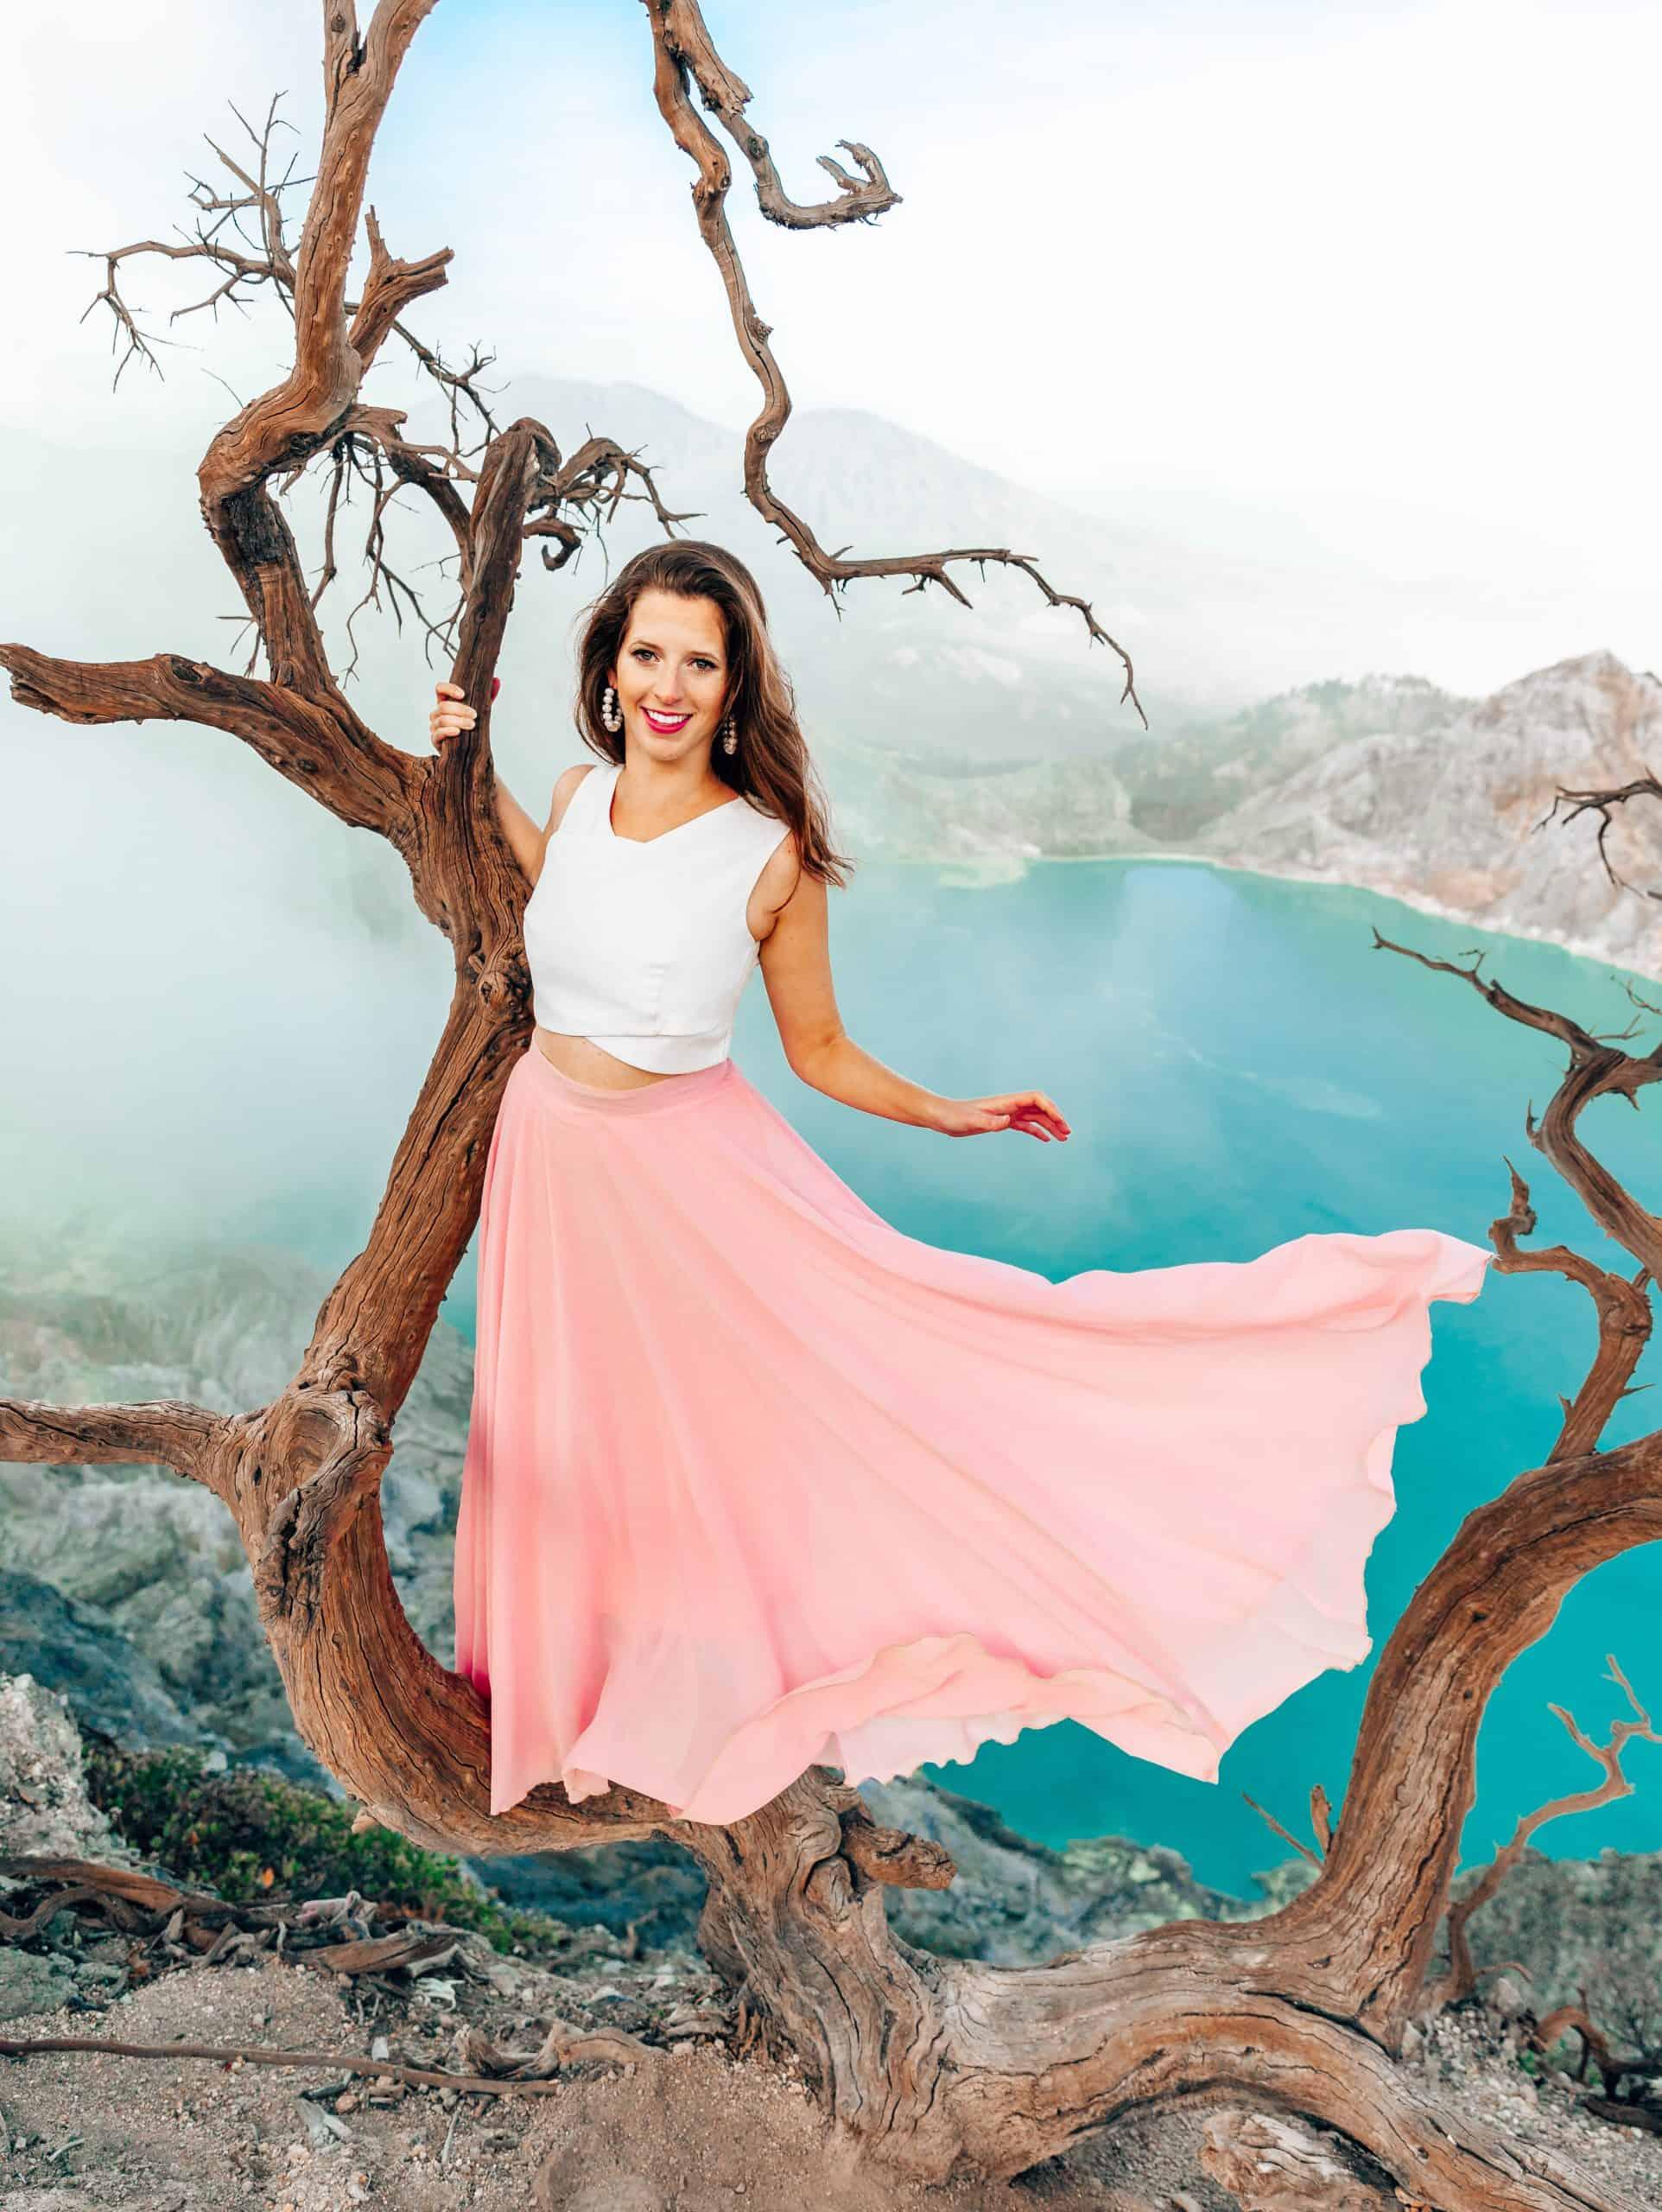 Instagrammable Tree on Mount Ijen - The Next Trip